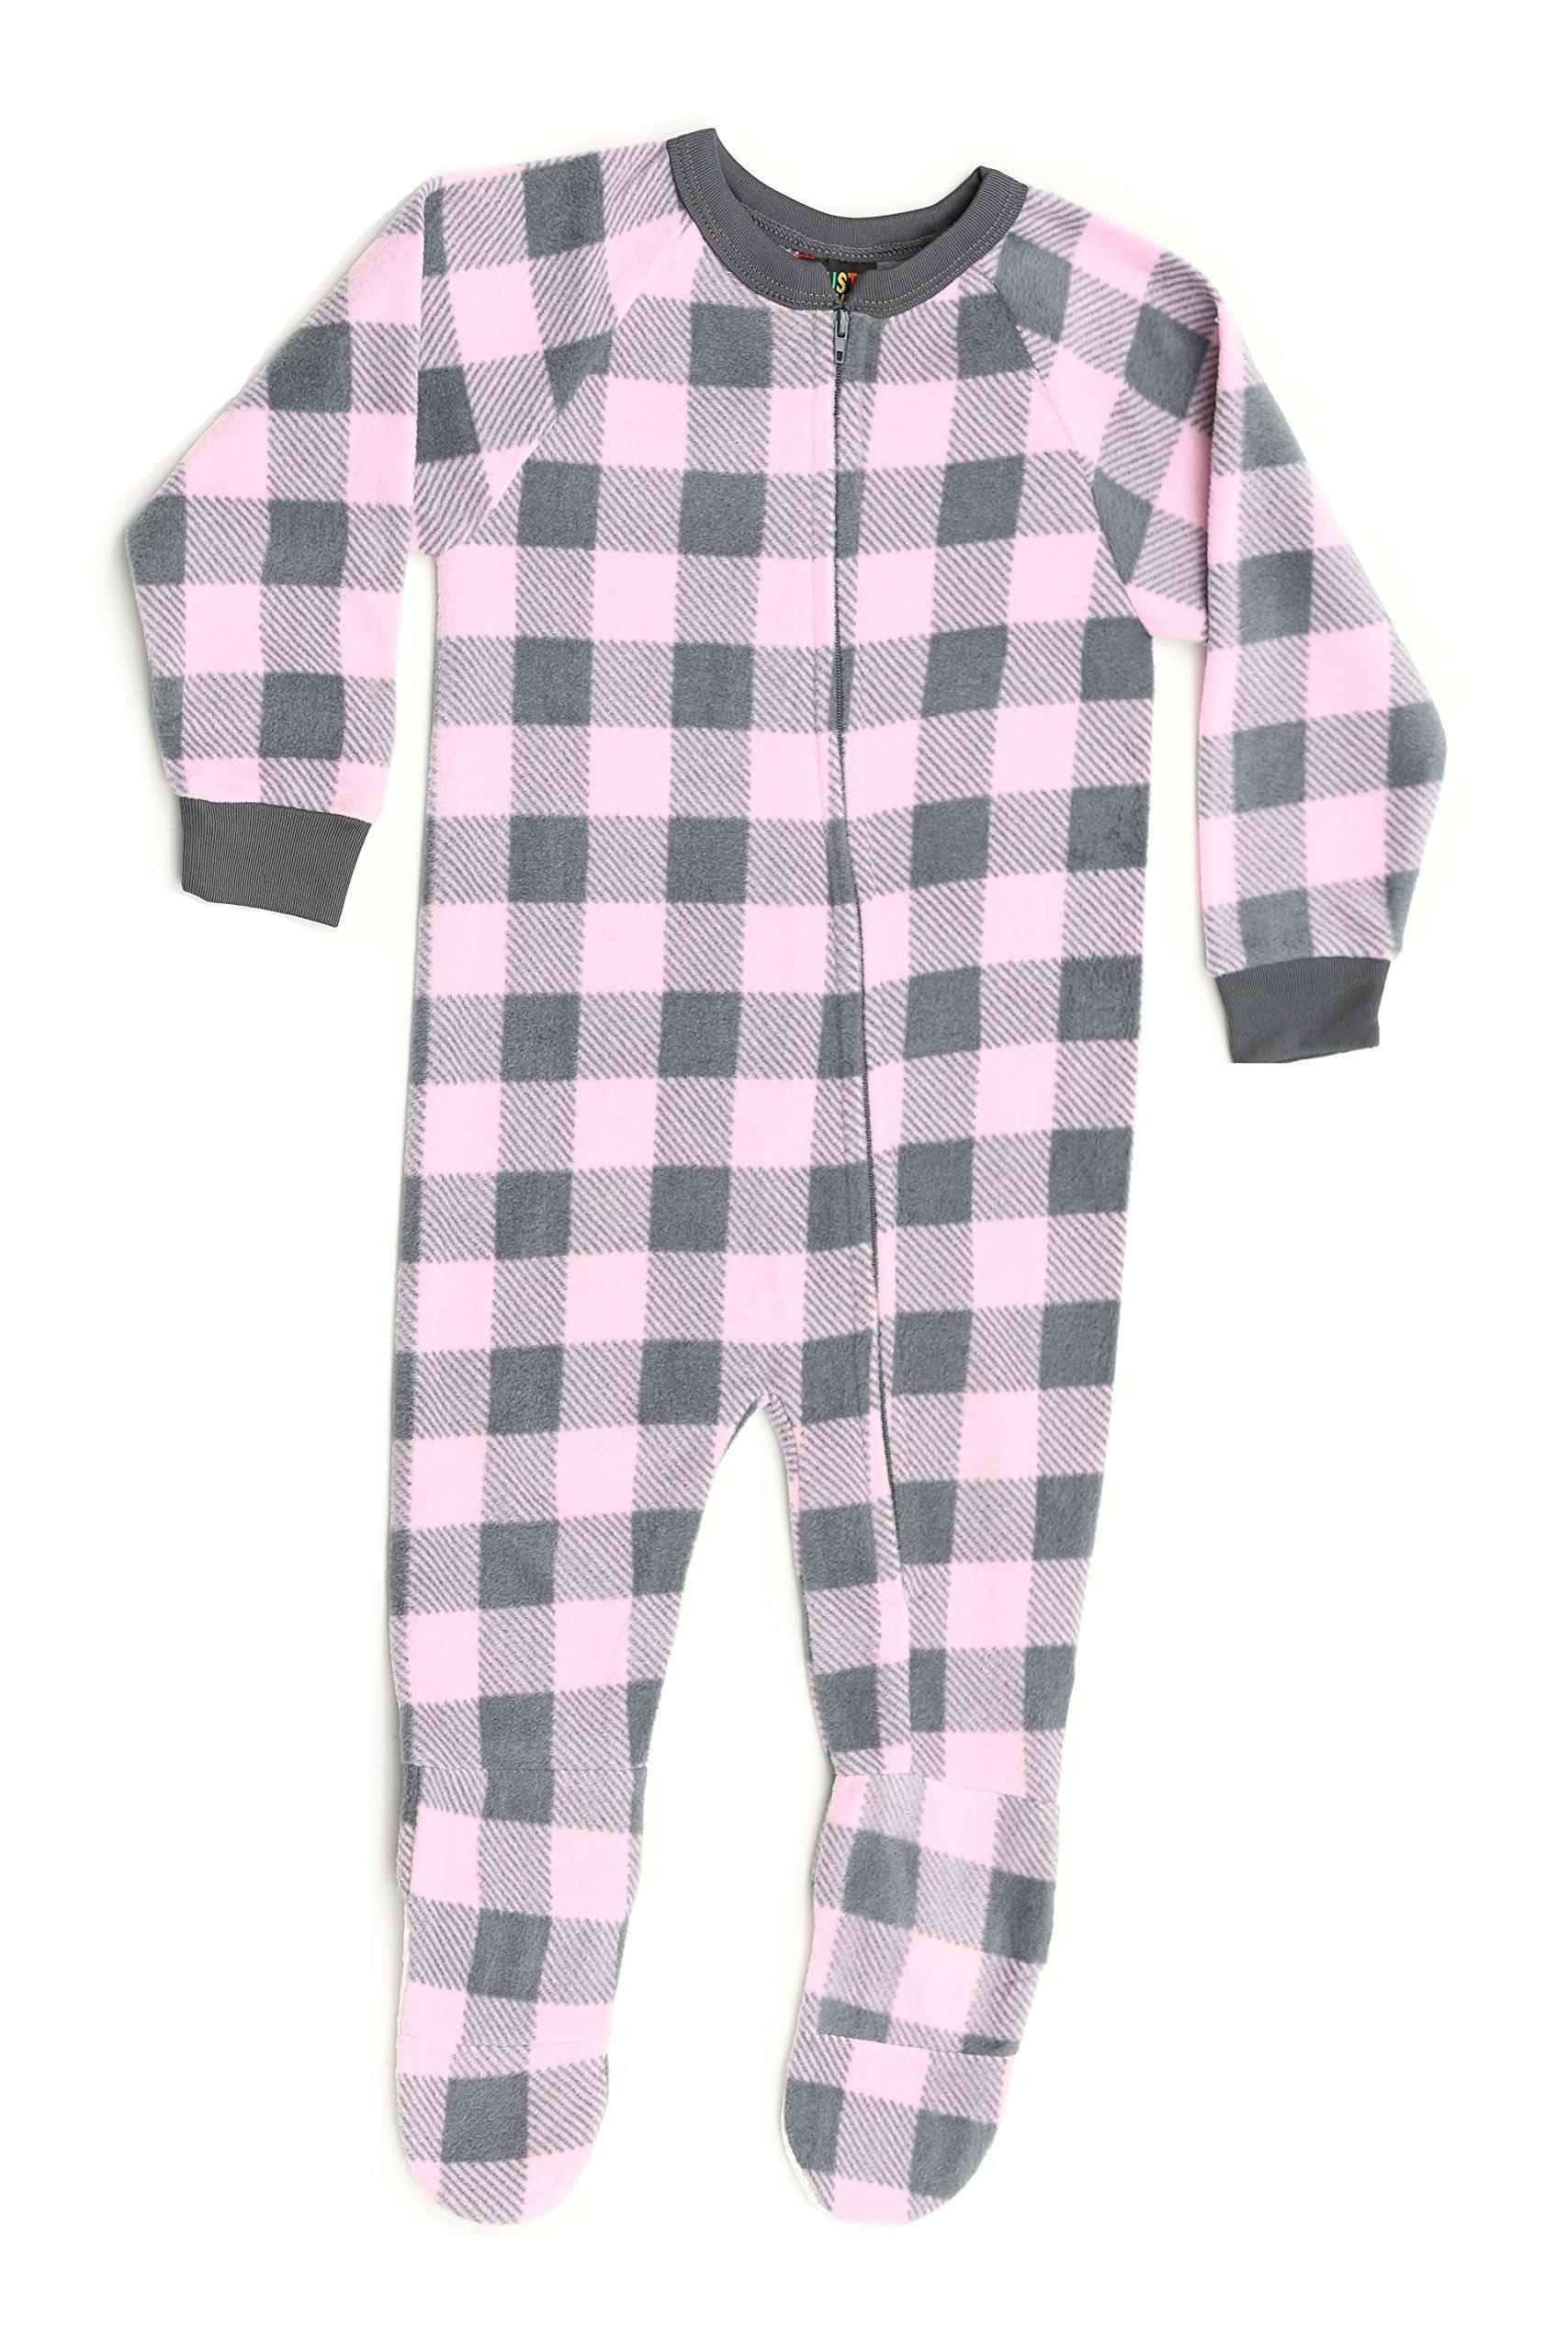 95599-6B-7/8 Just Love Footed Pajamas / Micro Fleece Blanket Sleepers